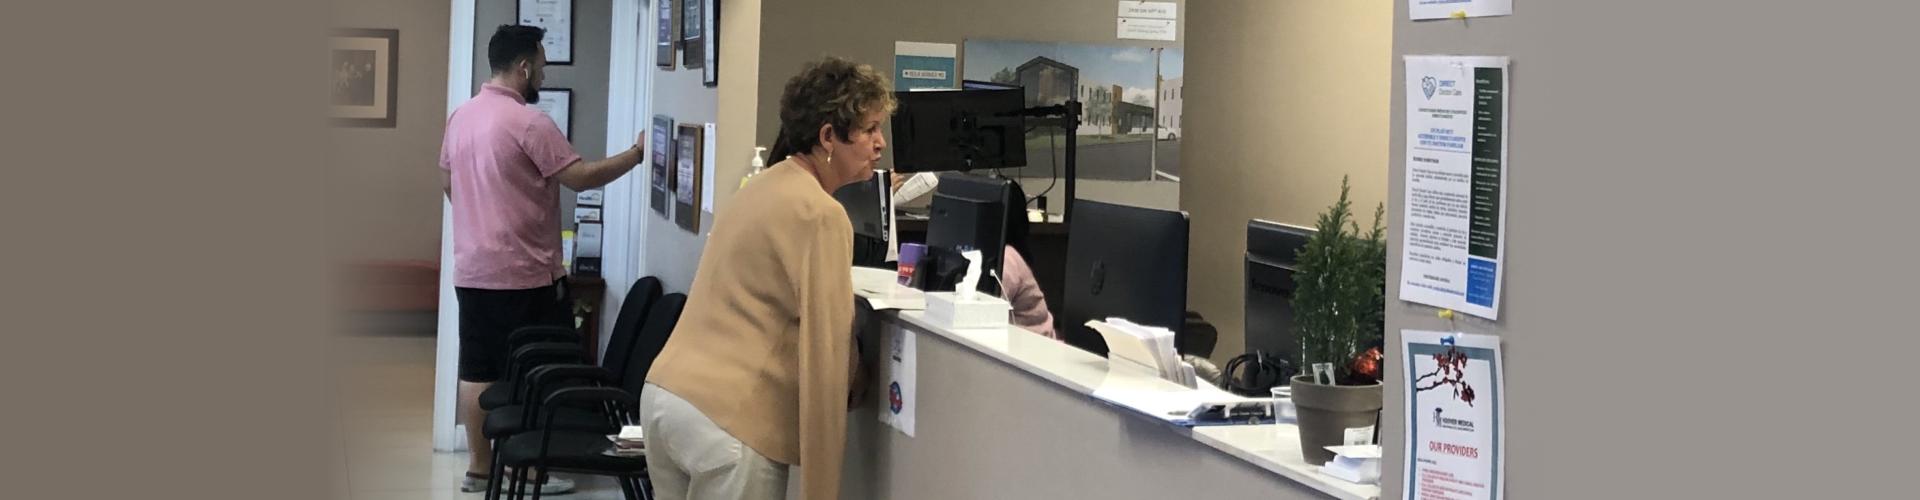 senior patient in hospital desk